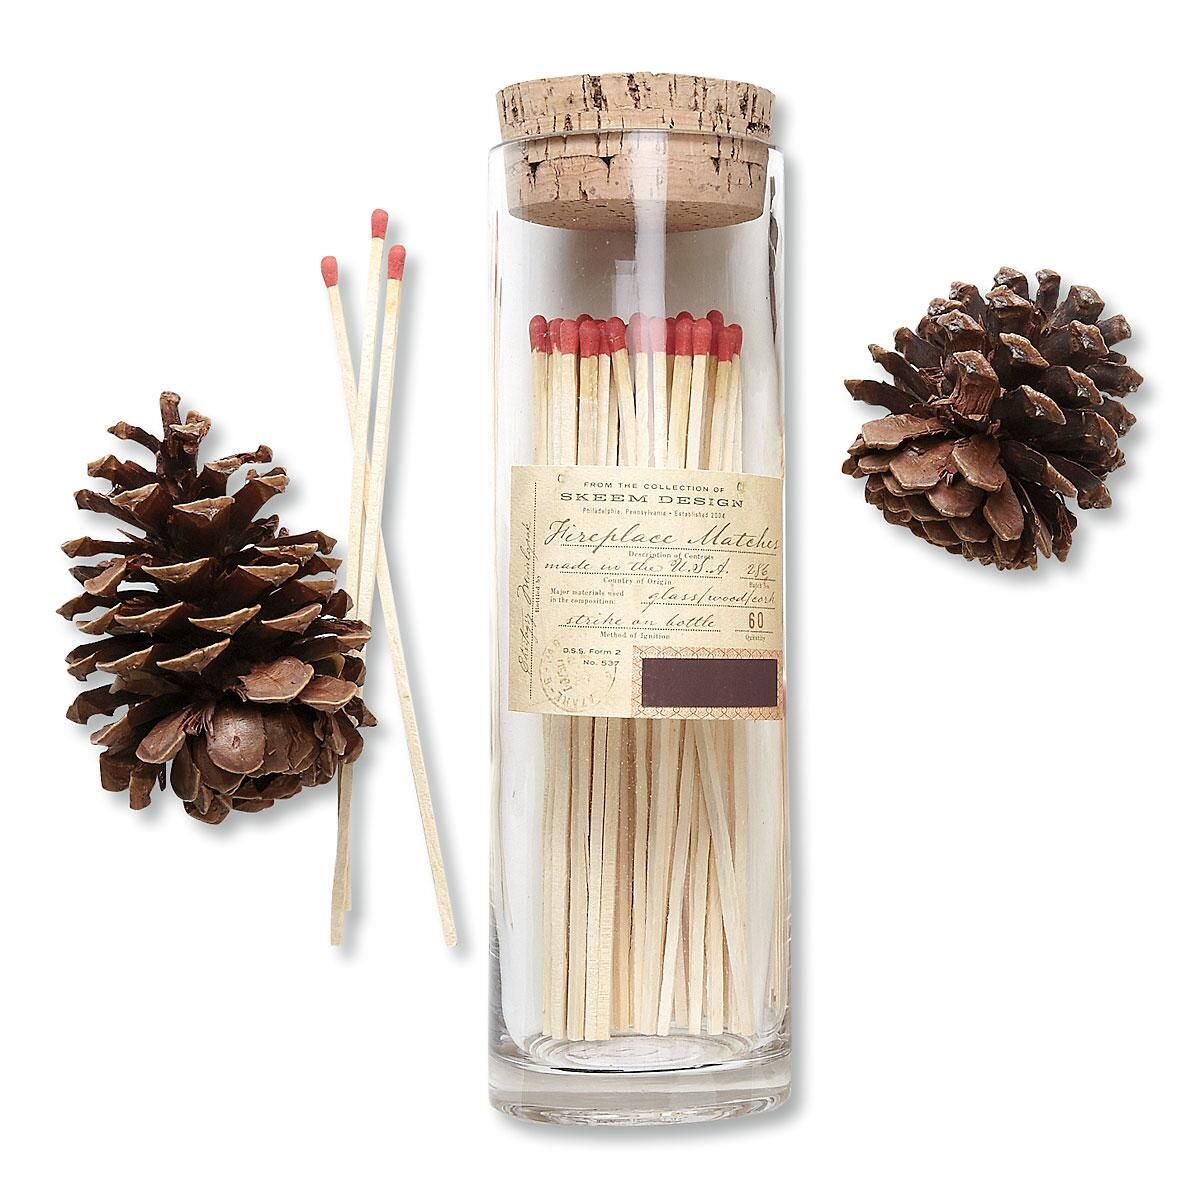 Fireplace Match Bottle by Skeem Design